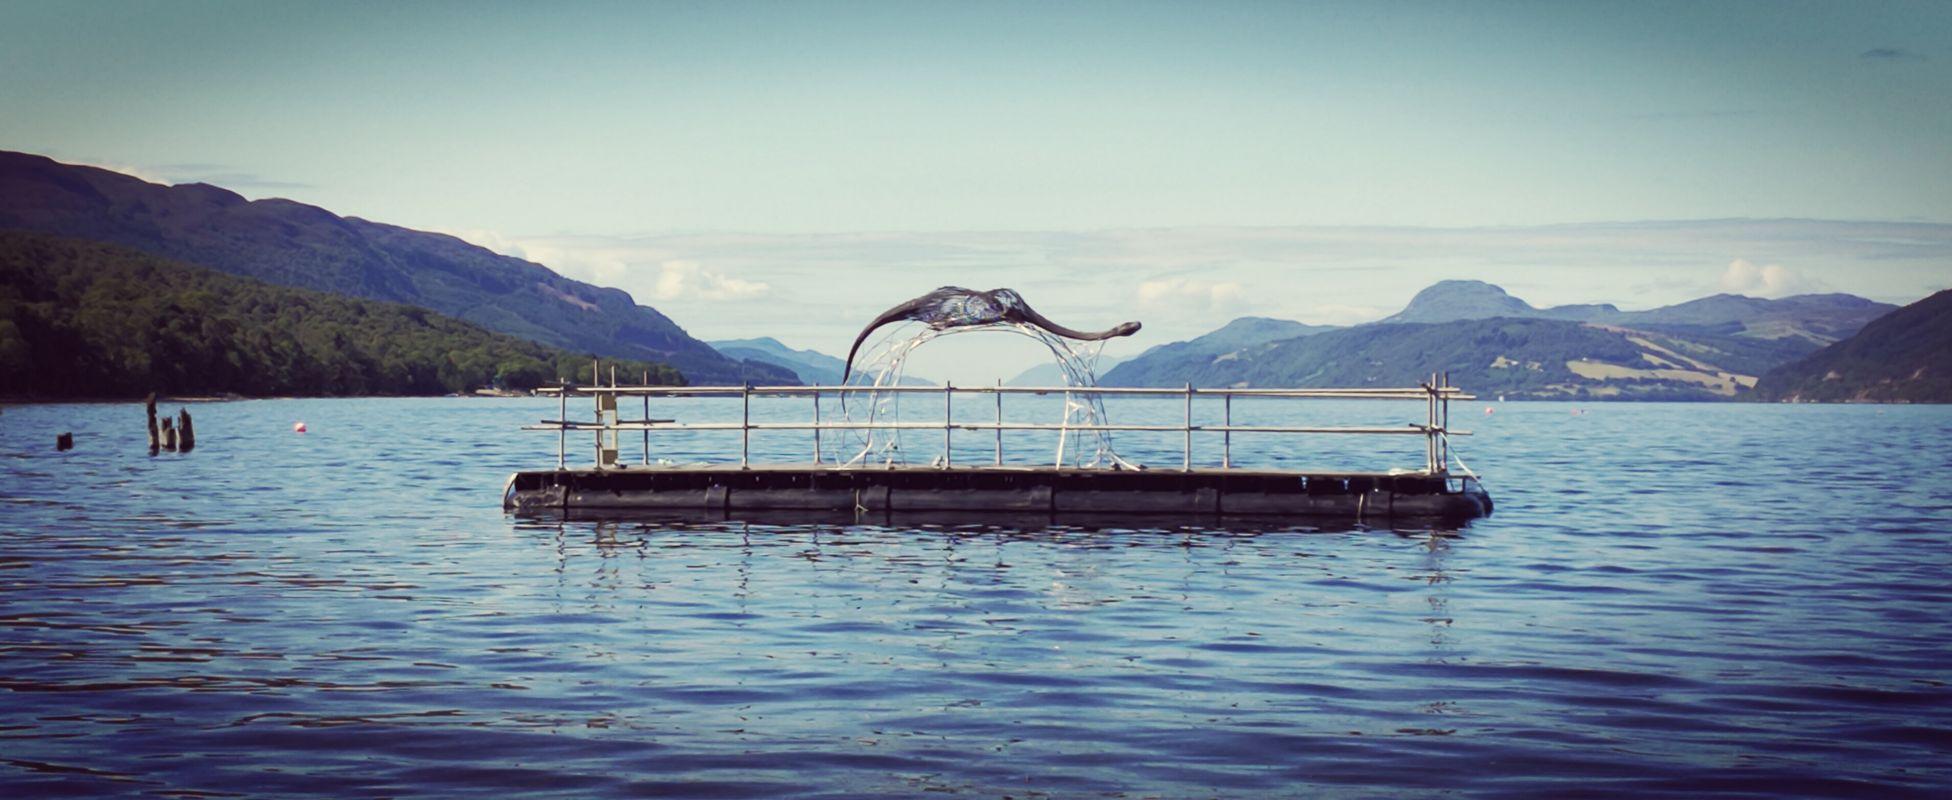 Wedding platform,Loch Ness